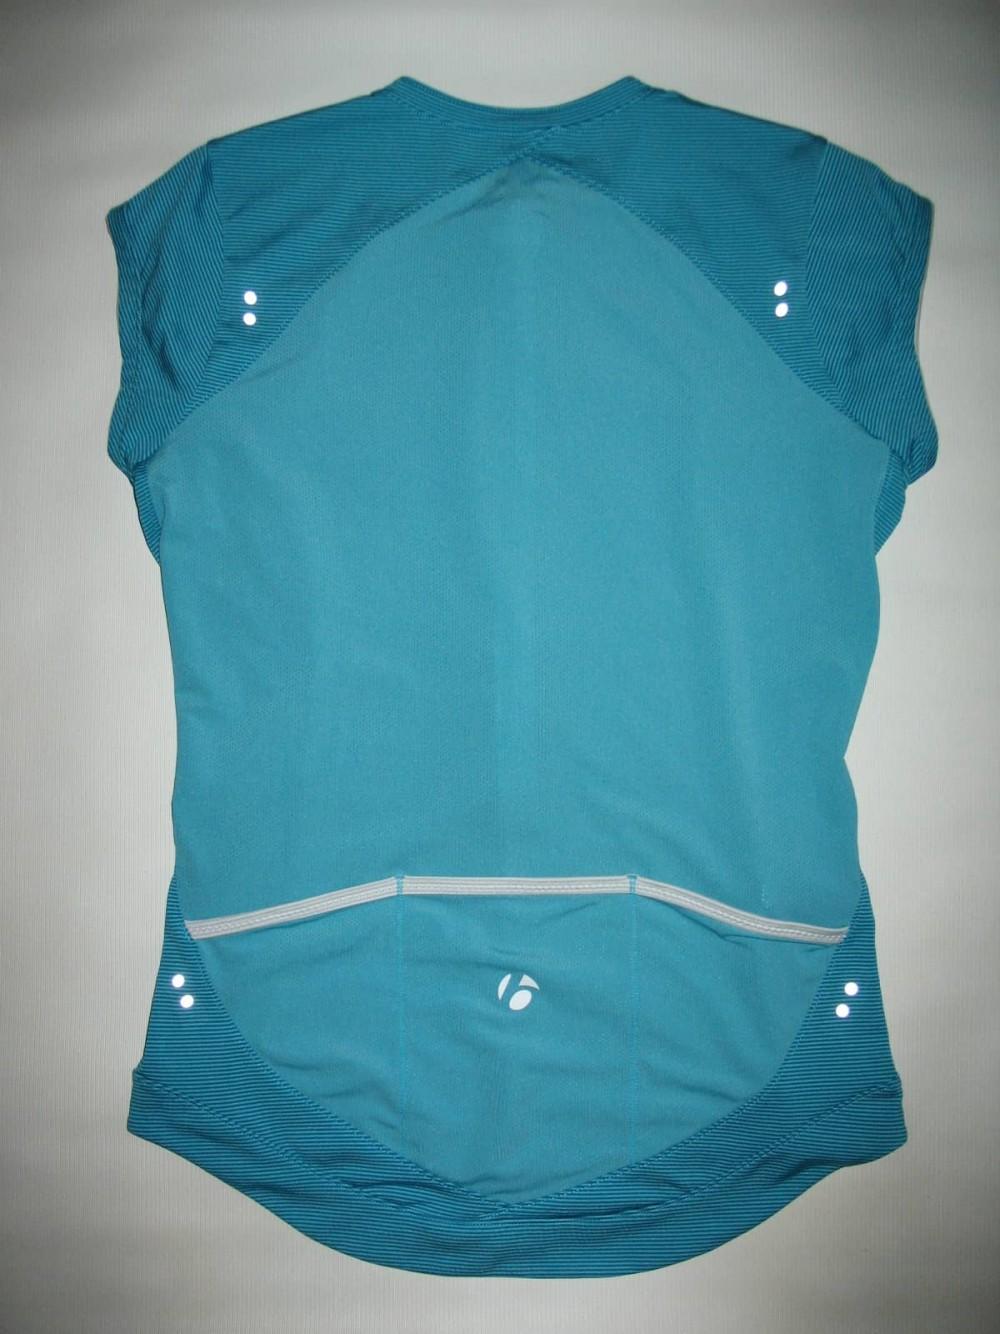 Веломайка BONTRAGER vella cycling jersey lady (размер M) - 4